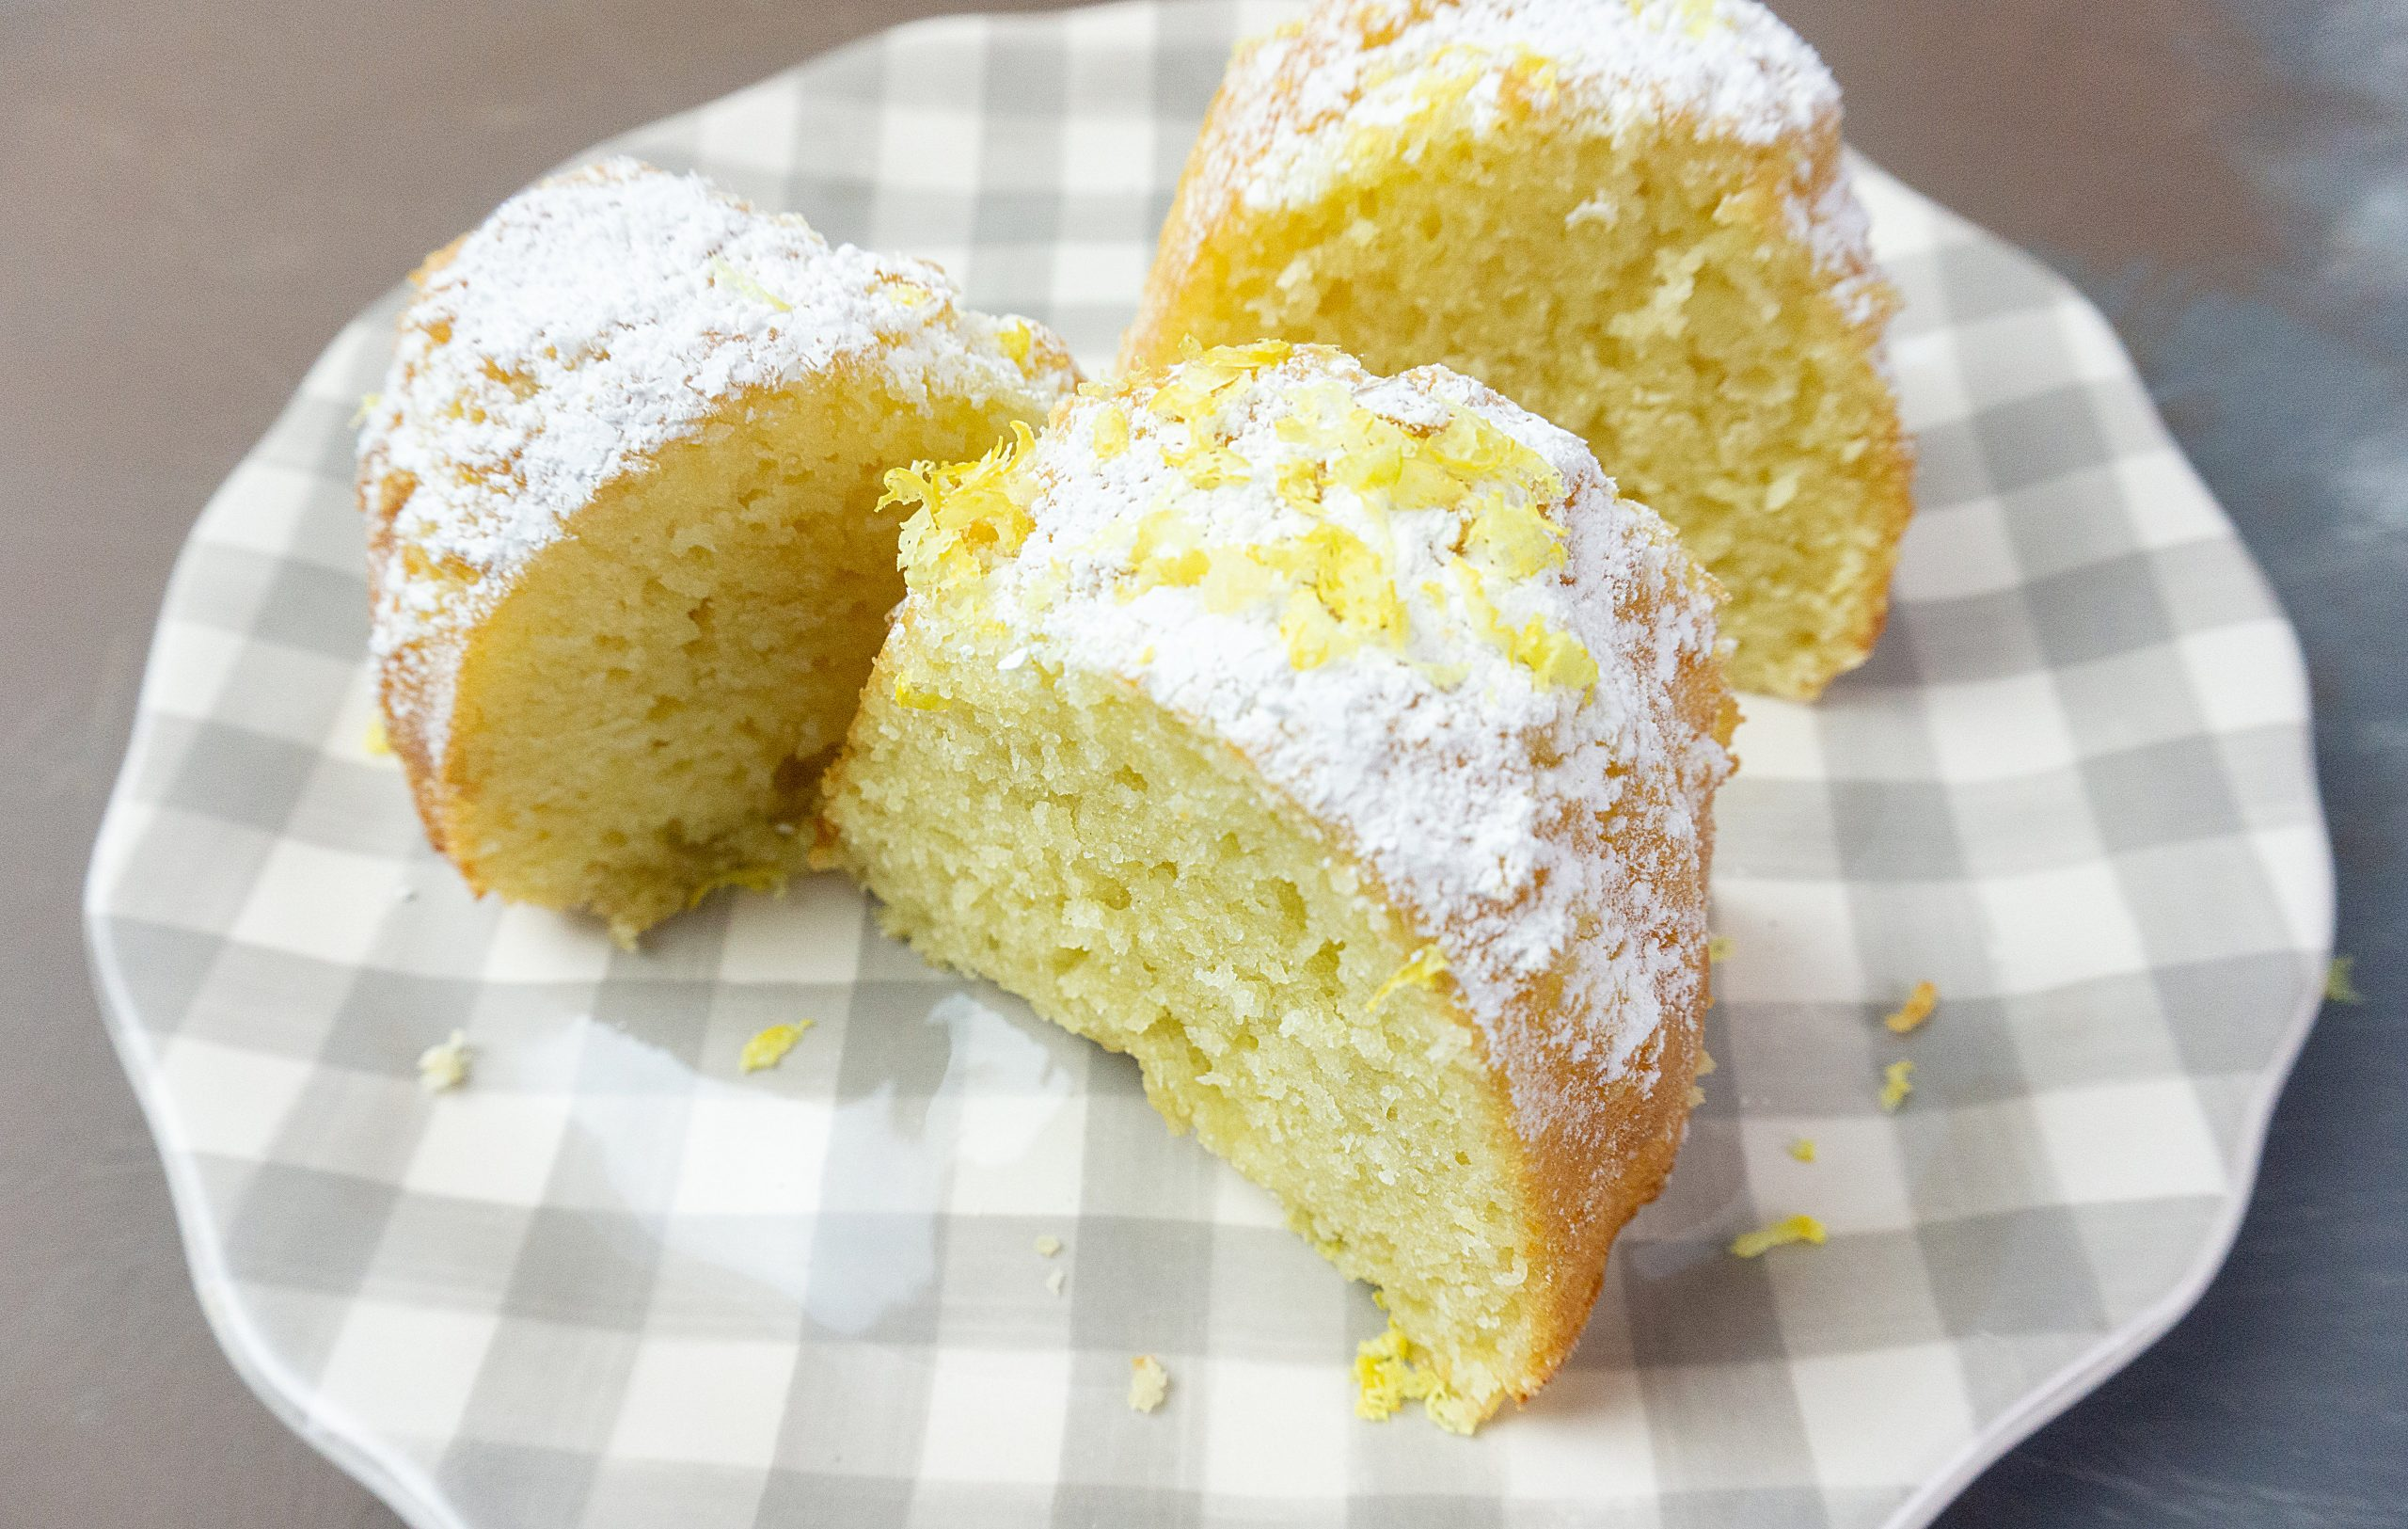 Meyer Lemon Bundt Cake topped with powdered sugar and lemon zest.